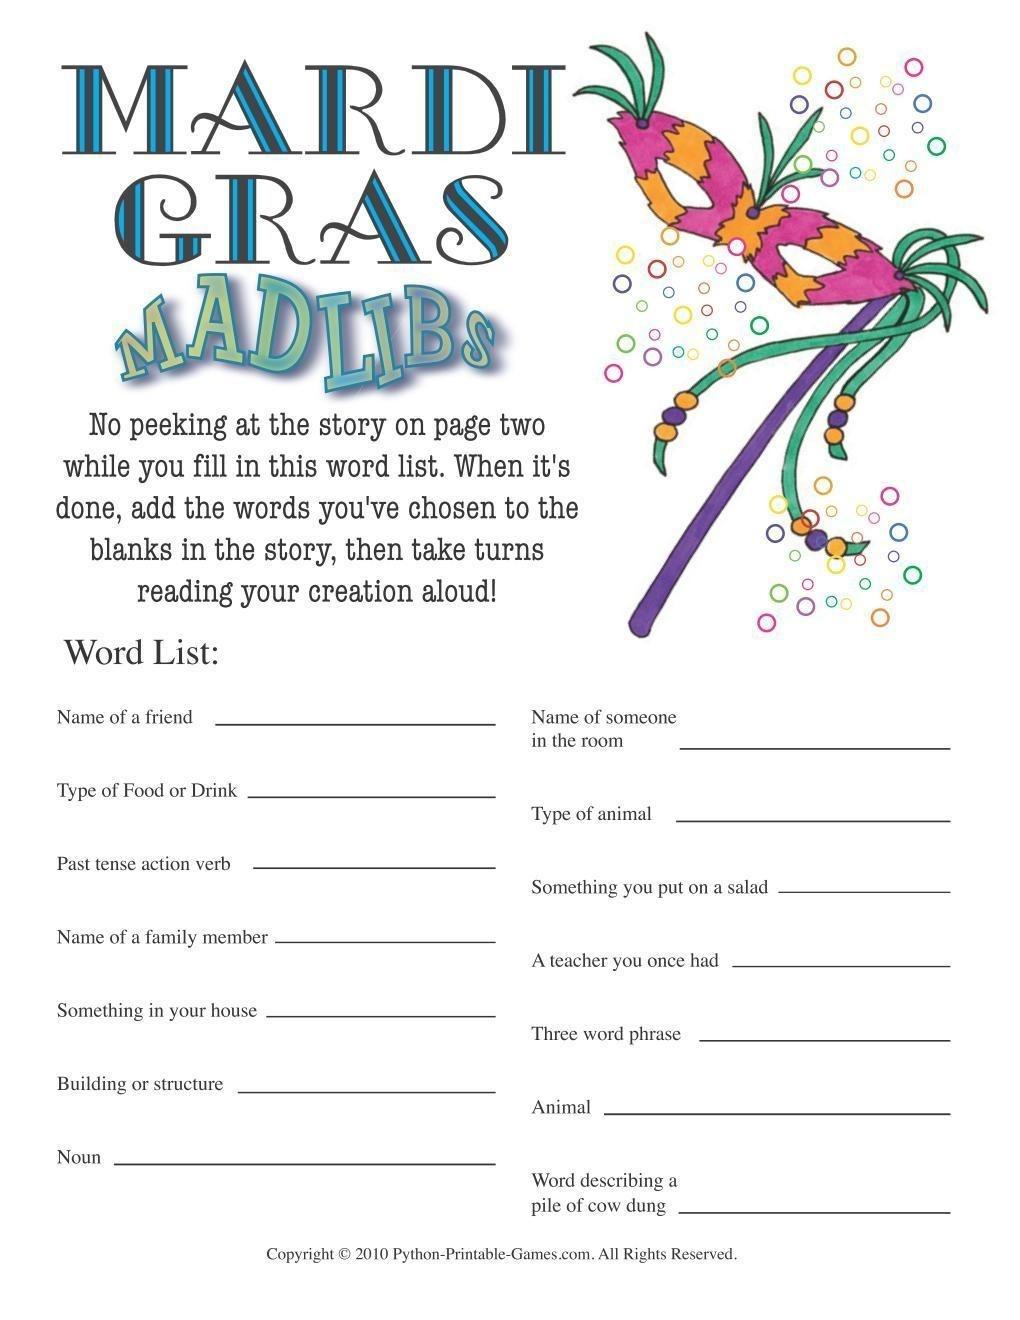 Mardi Gras: Mad Libs Game - Free Printable Mardi Gras Games